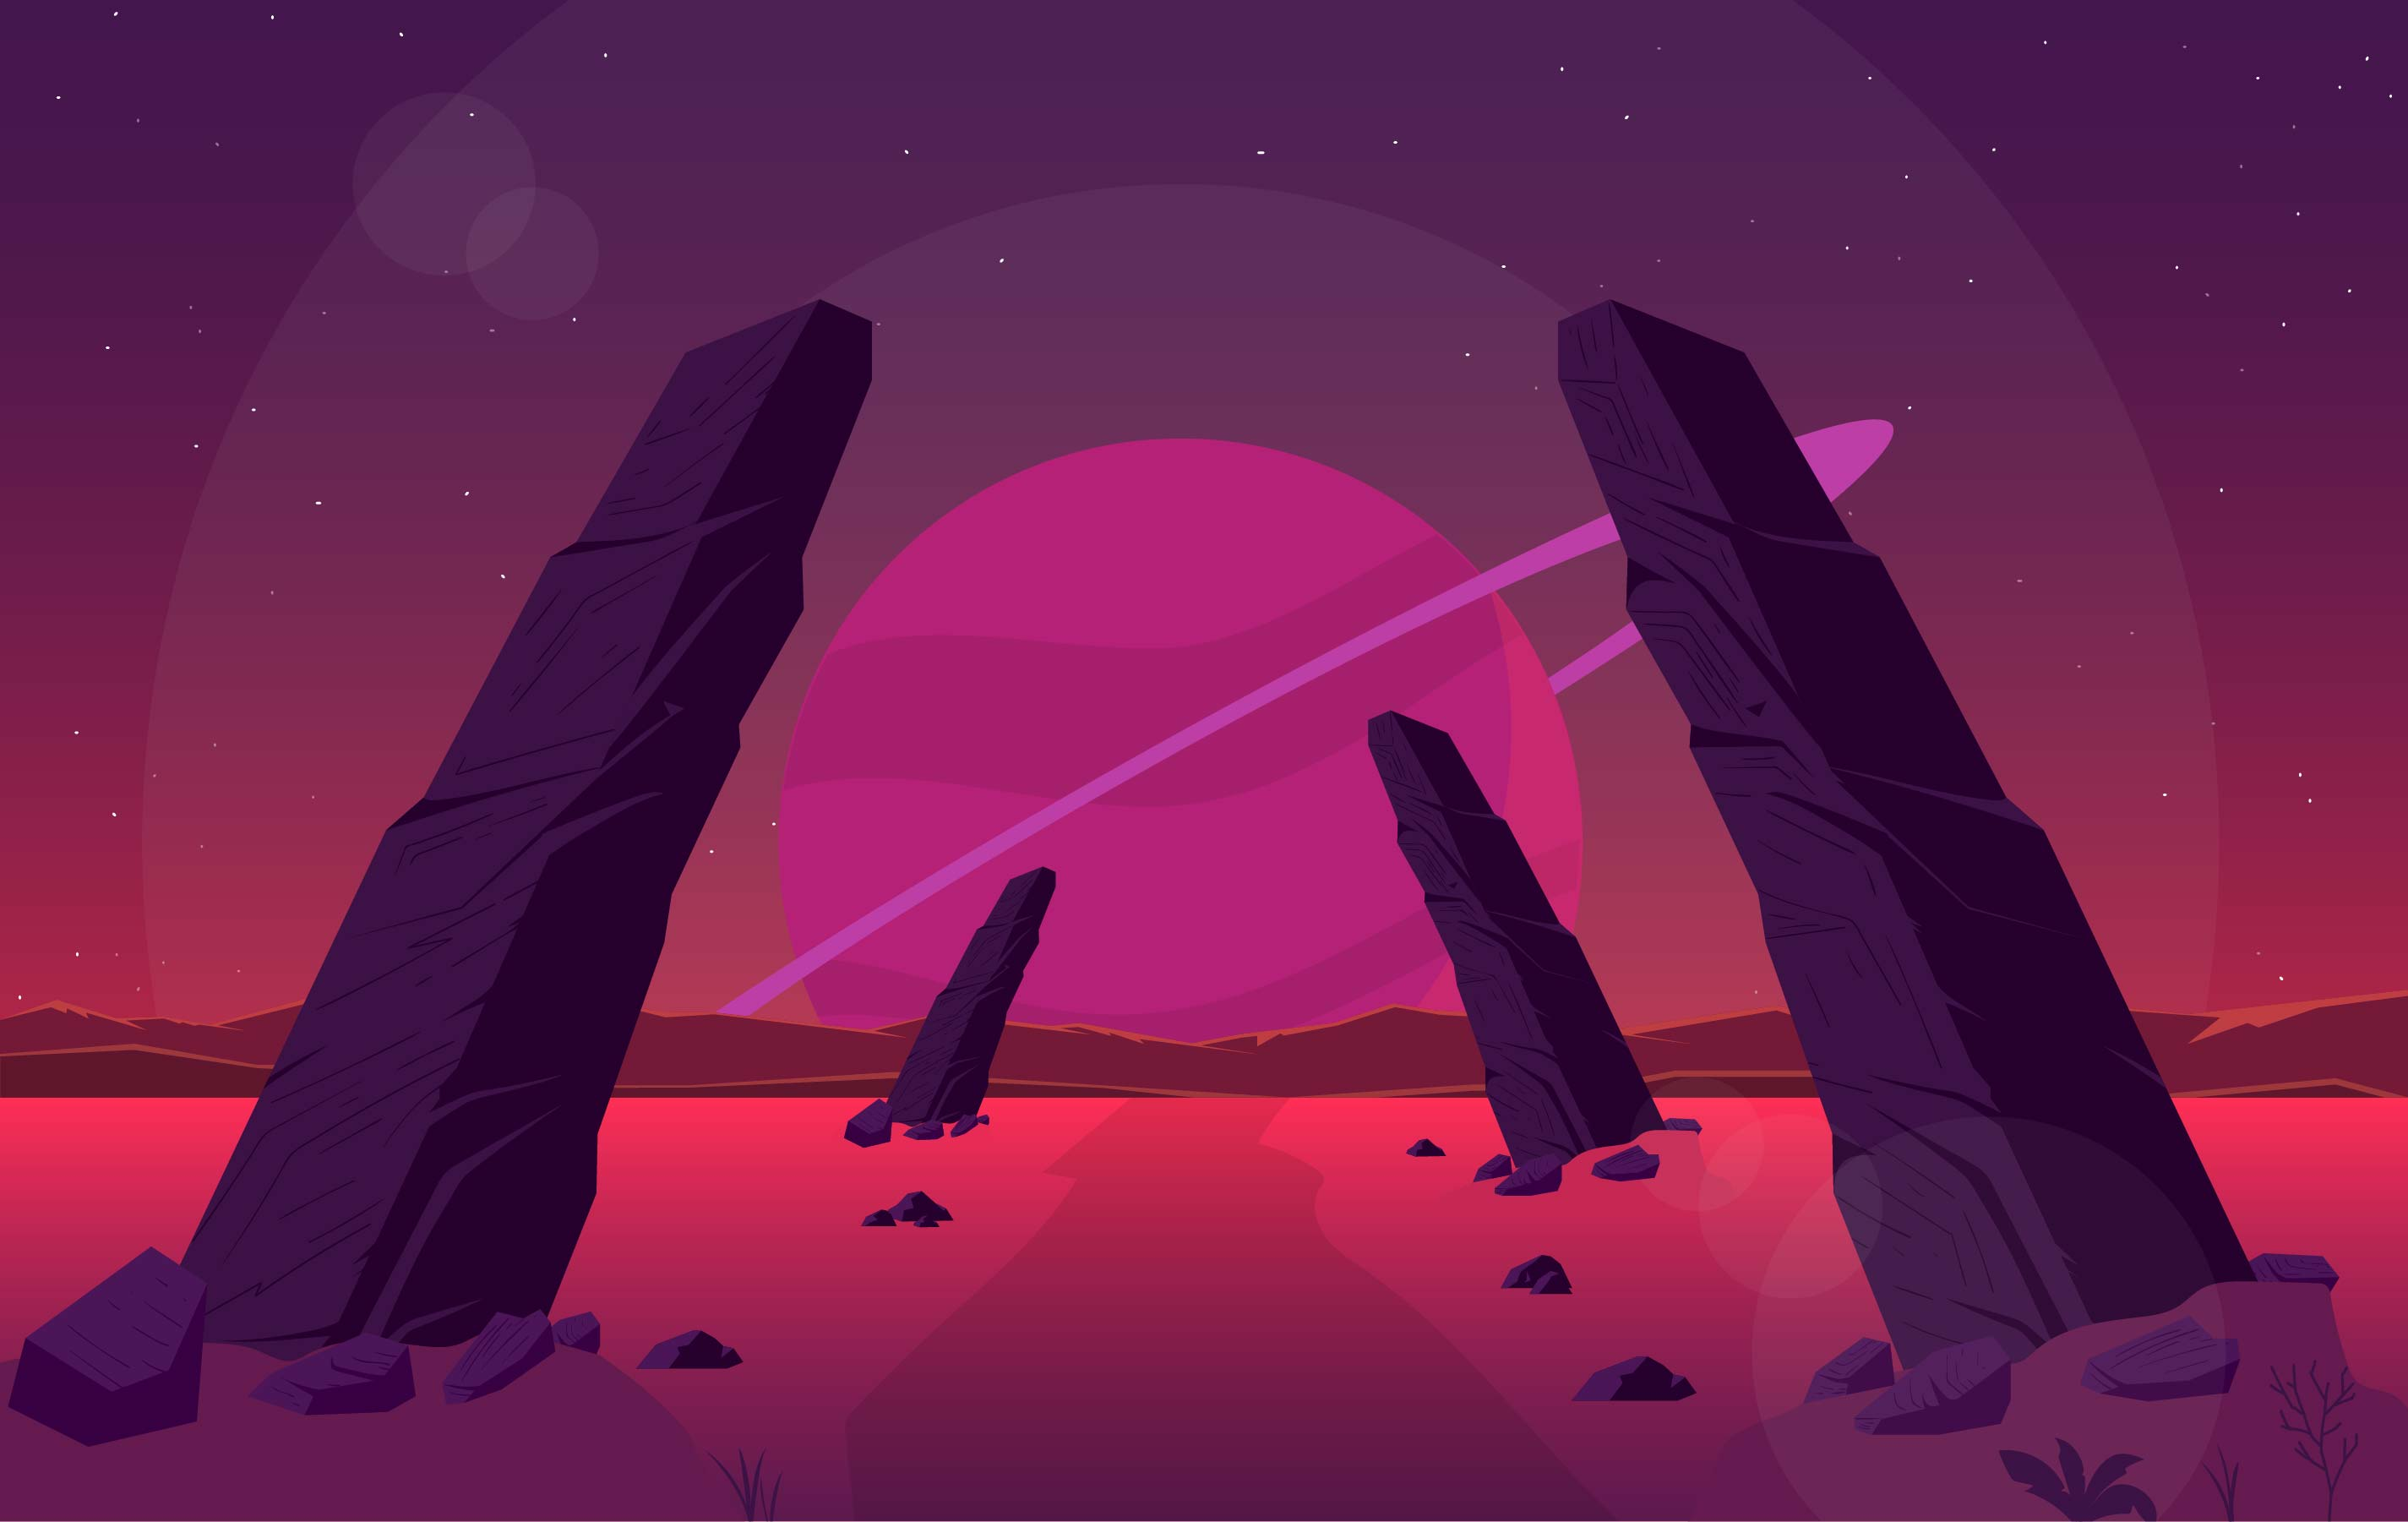 Landscape Illustration Vector Free: Vector Fantasy Landscape Illustration